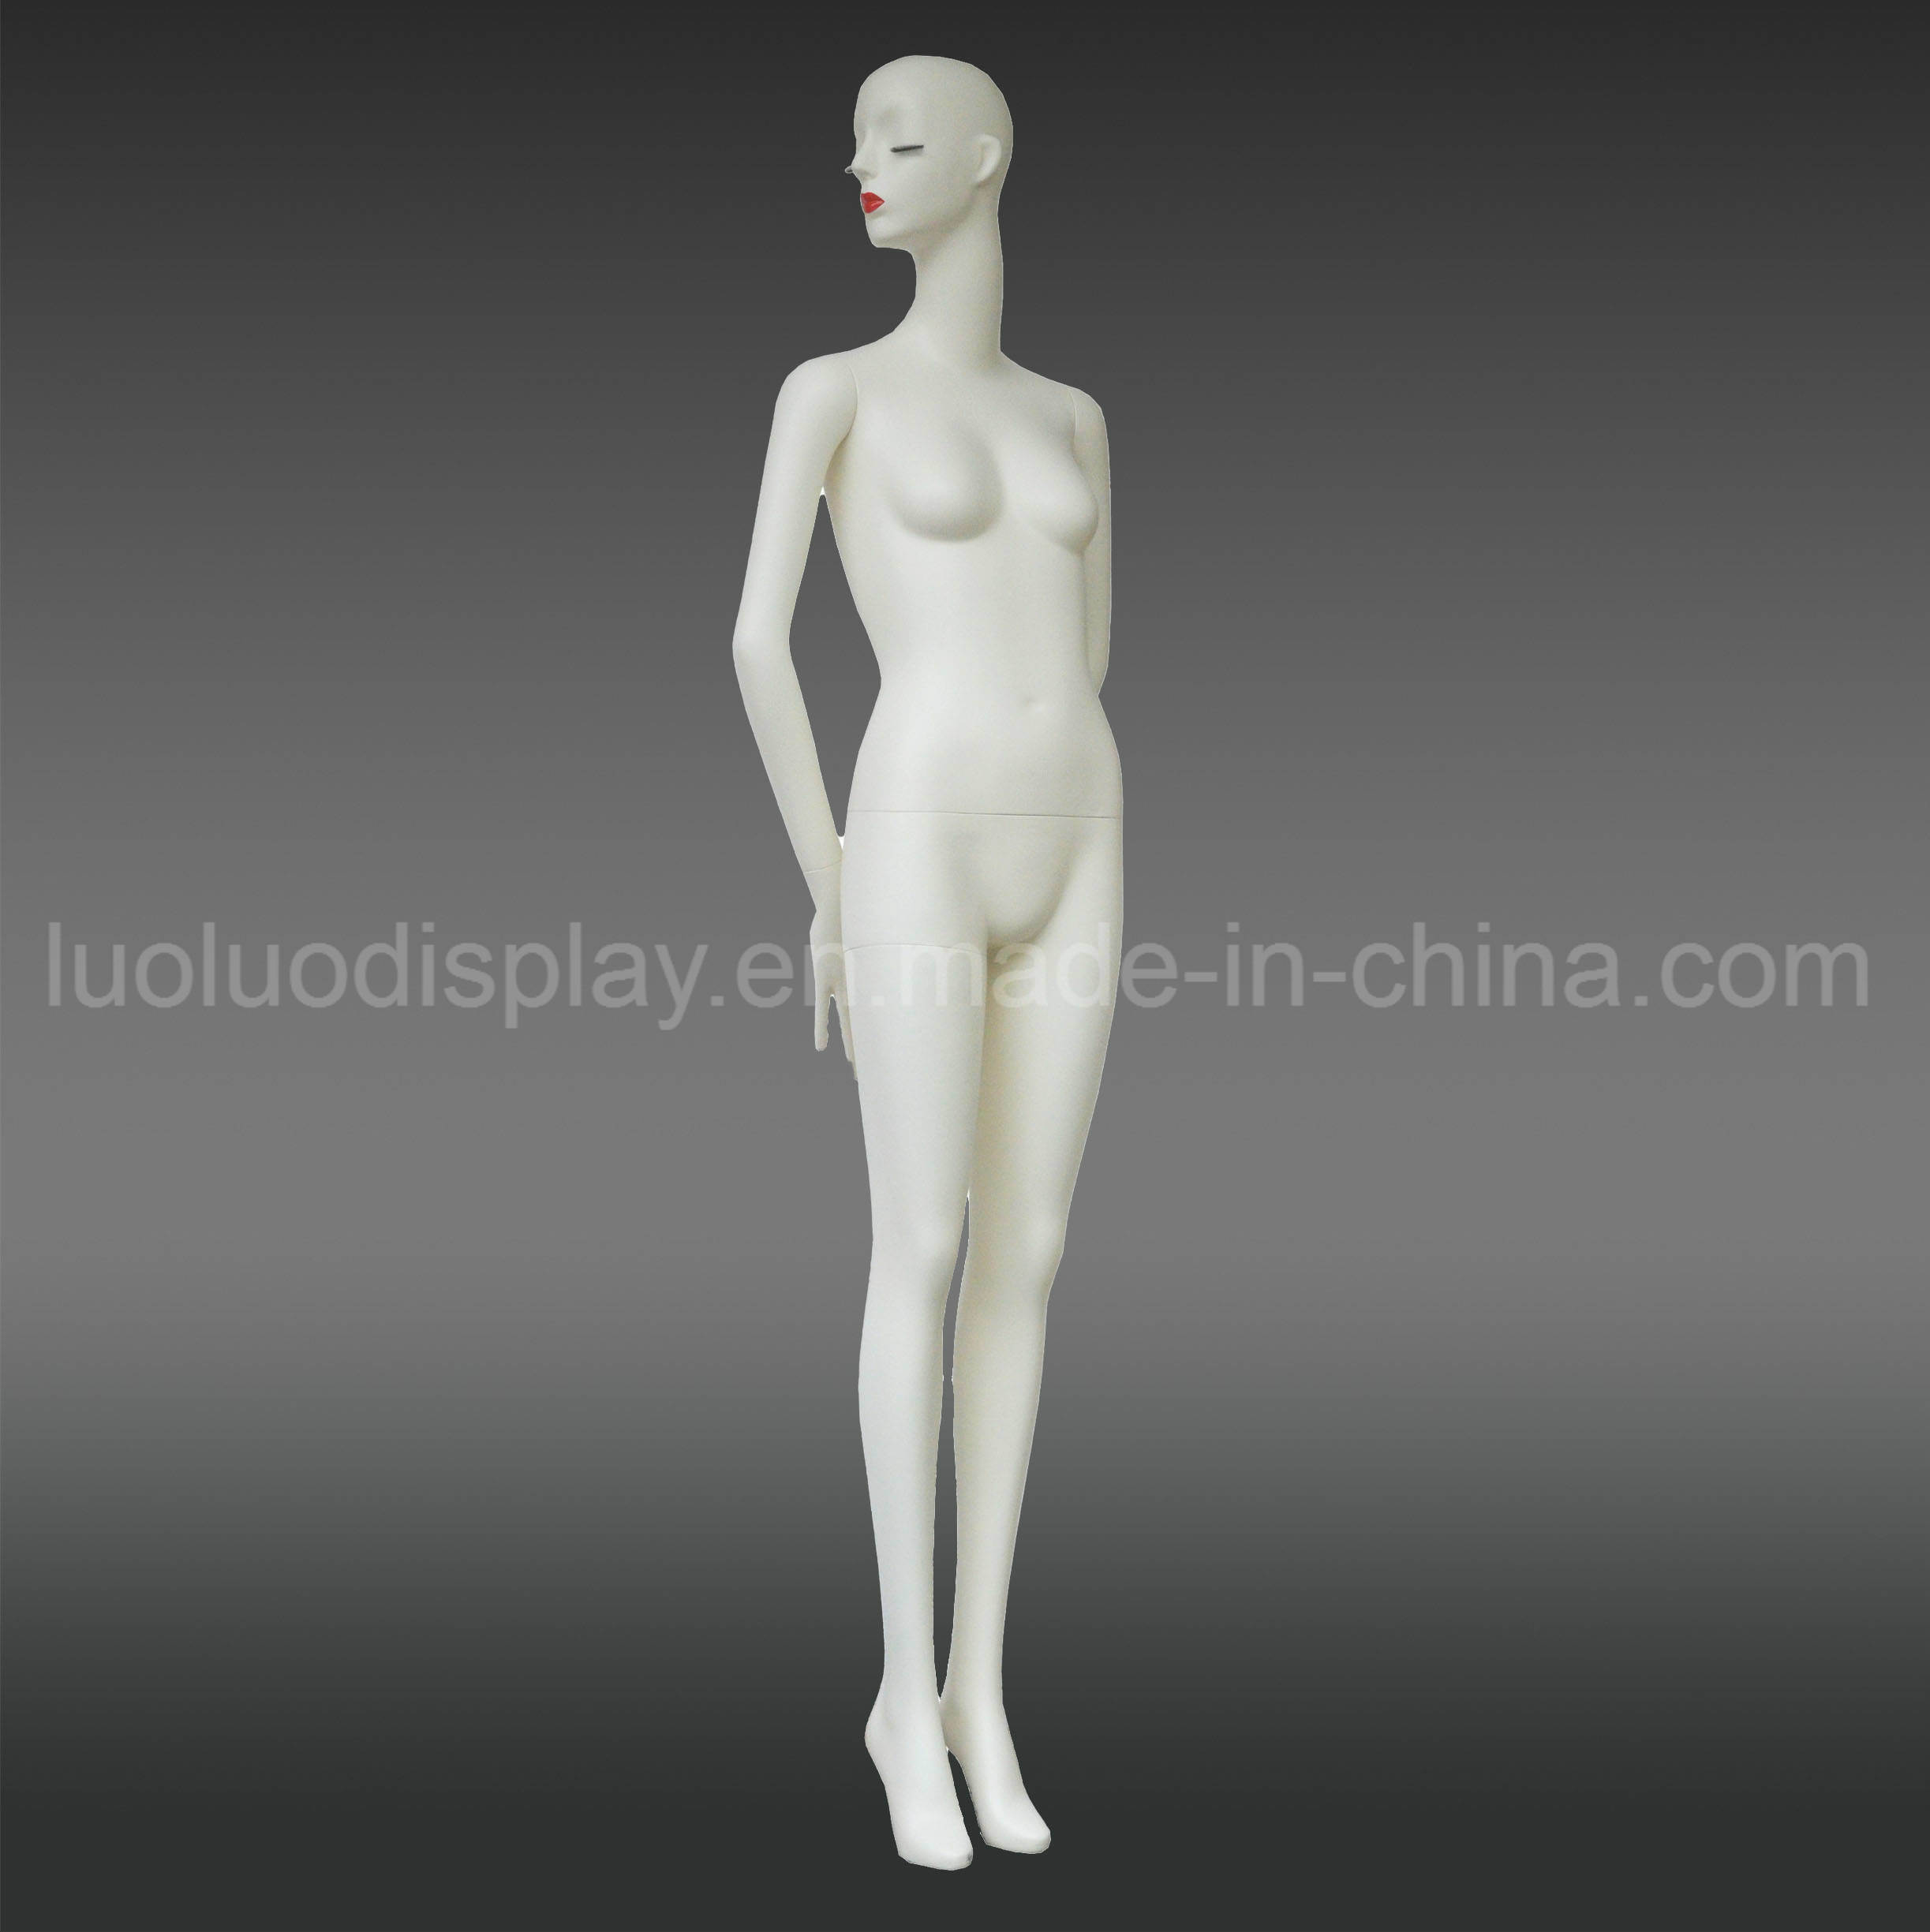 Original Design Female Mannequin for Wedding Dress